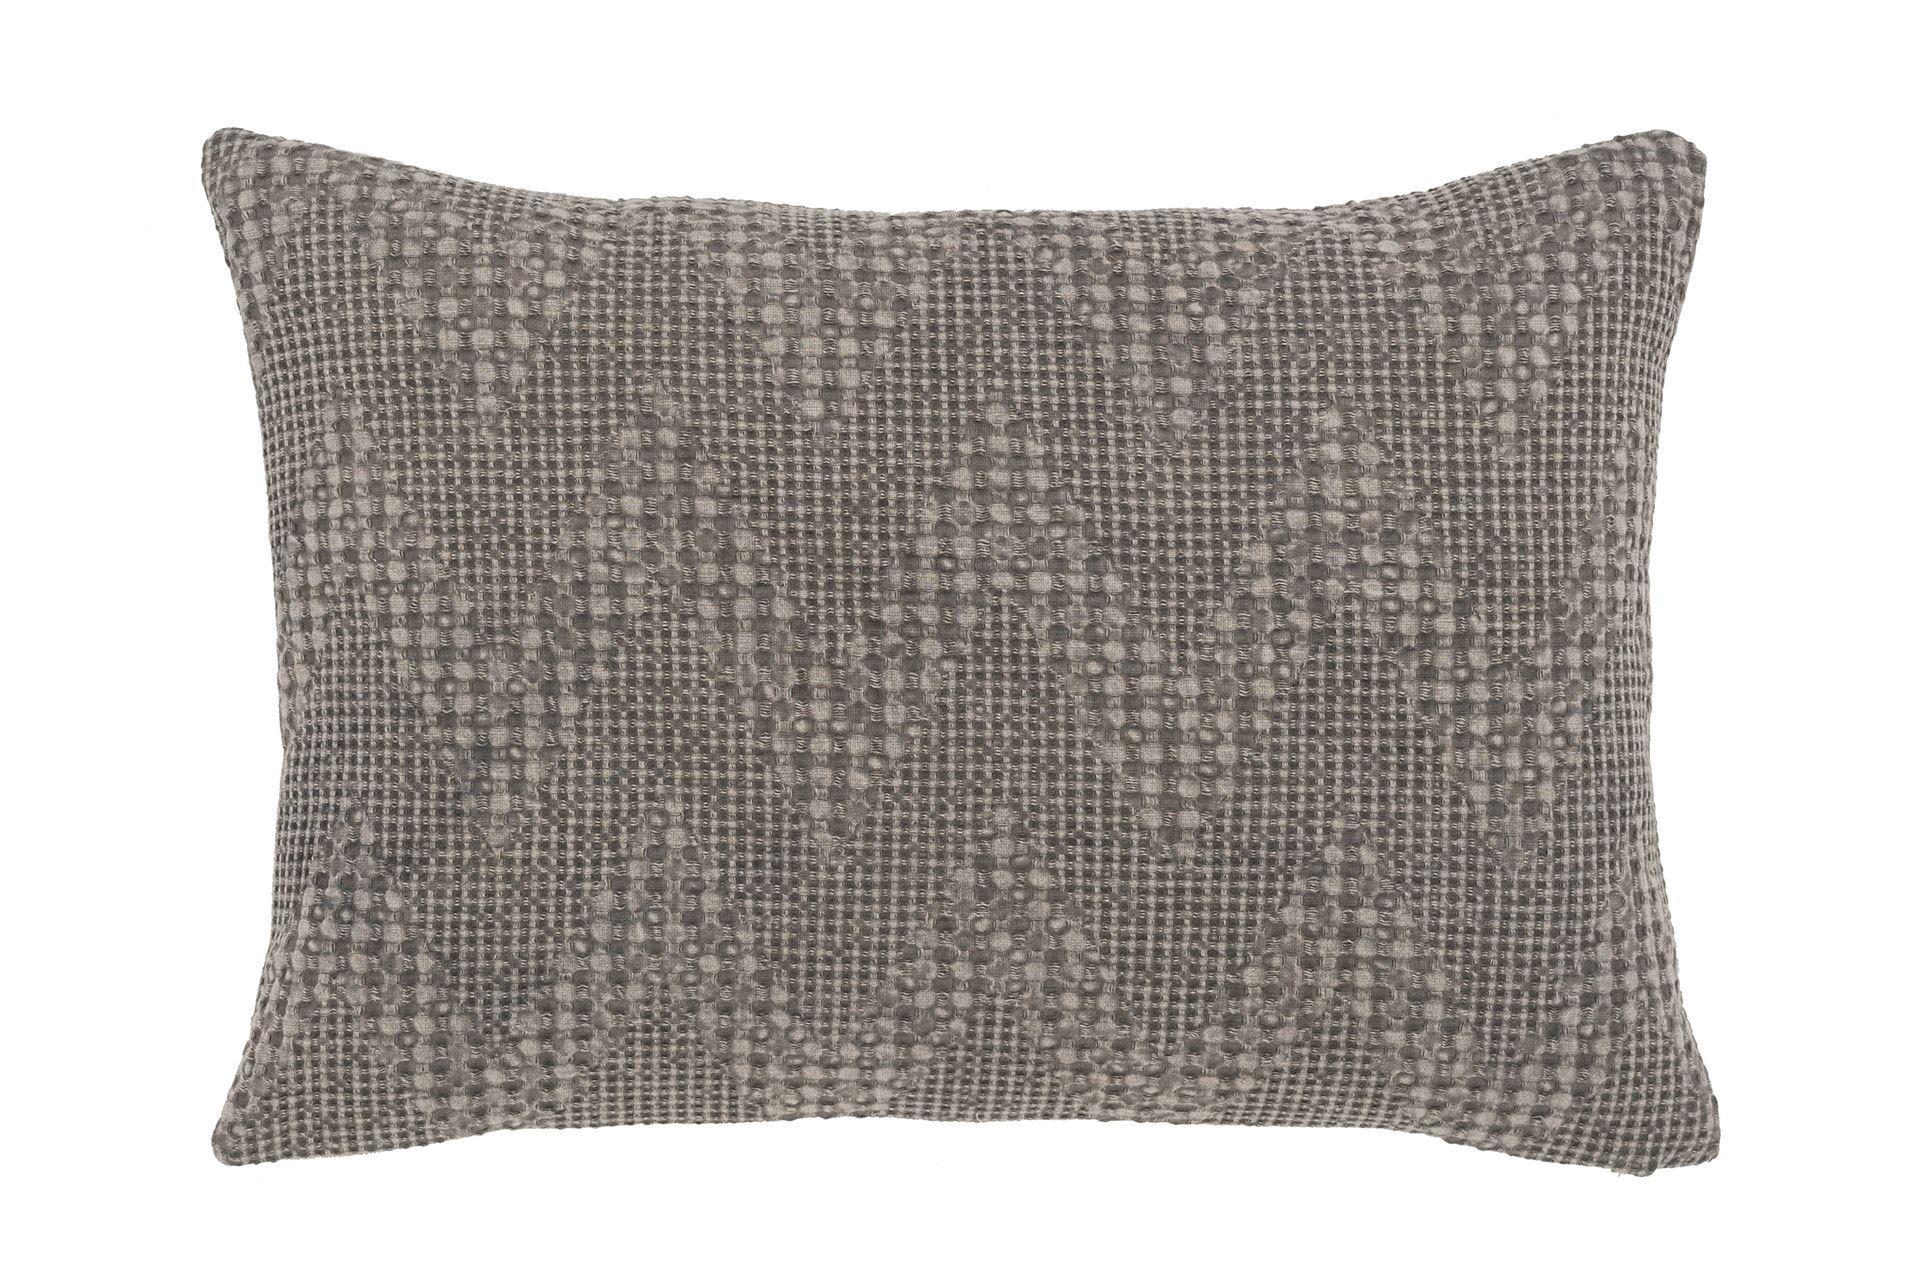 Decorative Pillows Living Spaces : Accent Pillow-Classic Chevron Grey 14X20 - Living Spaces